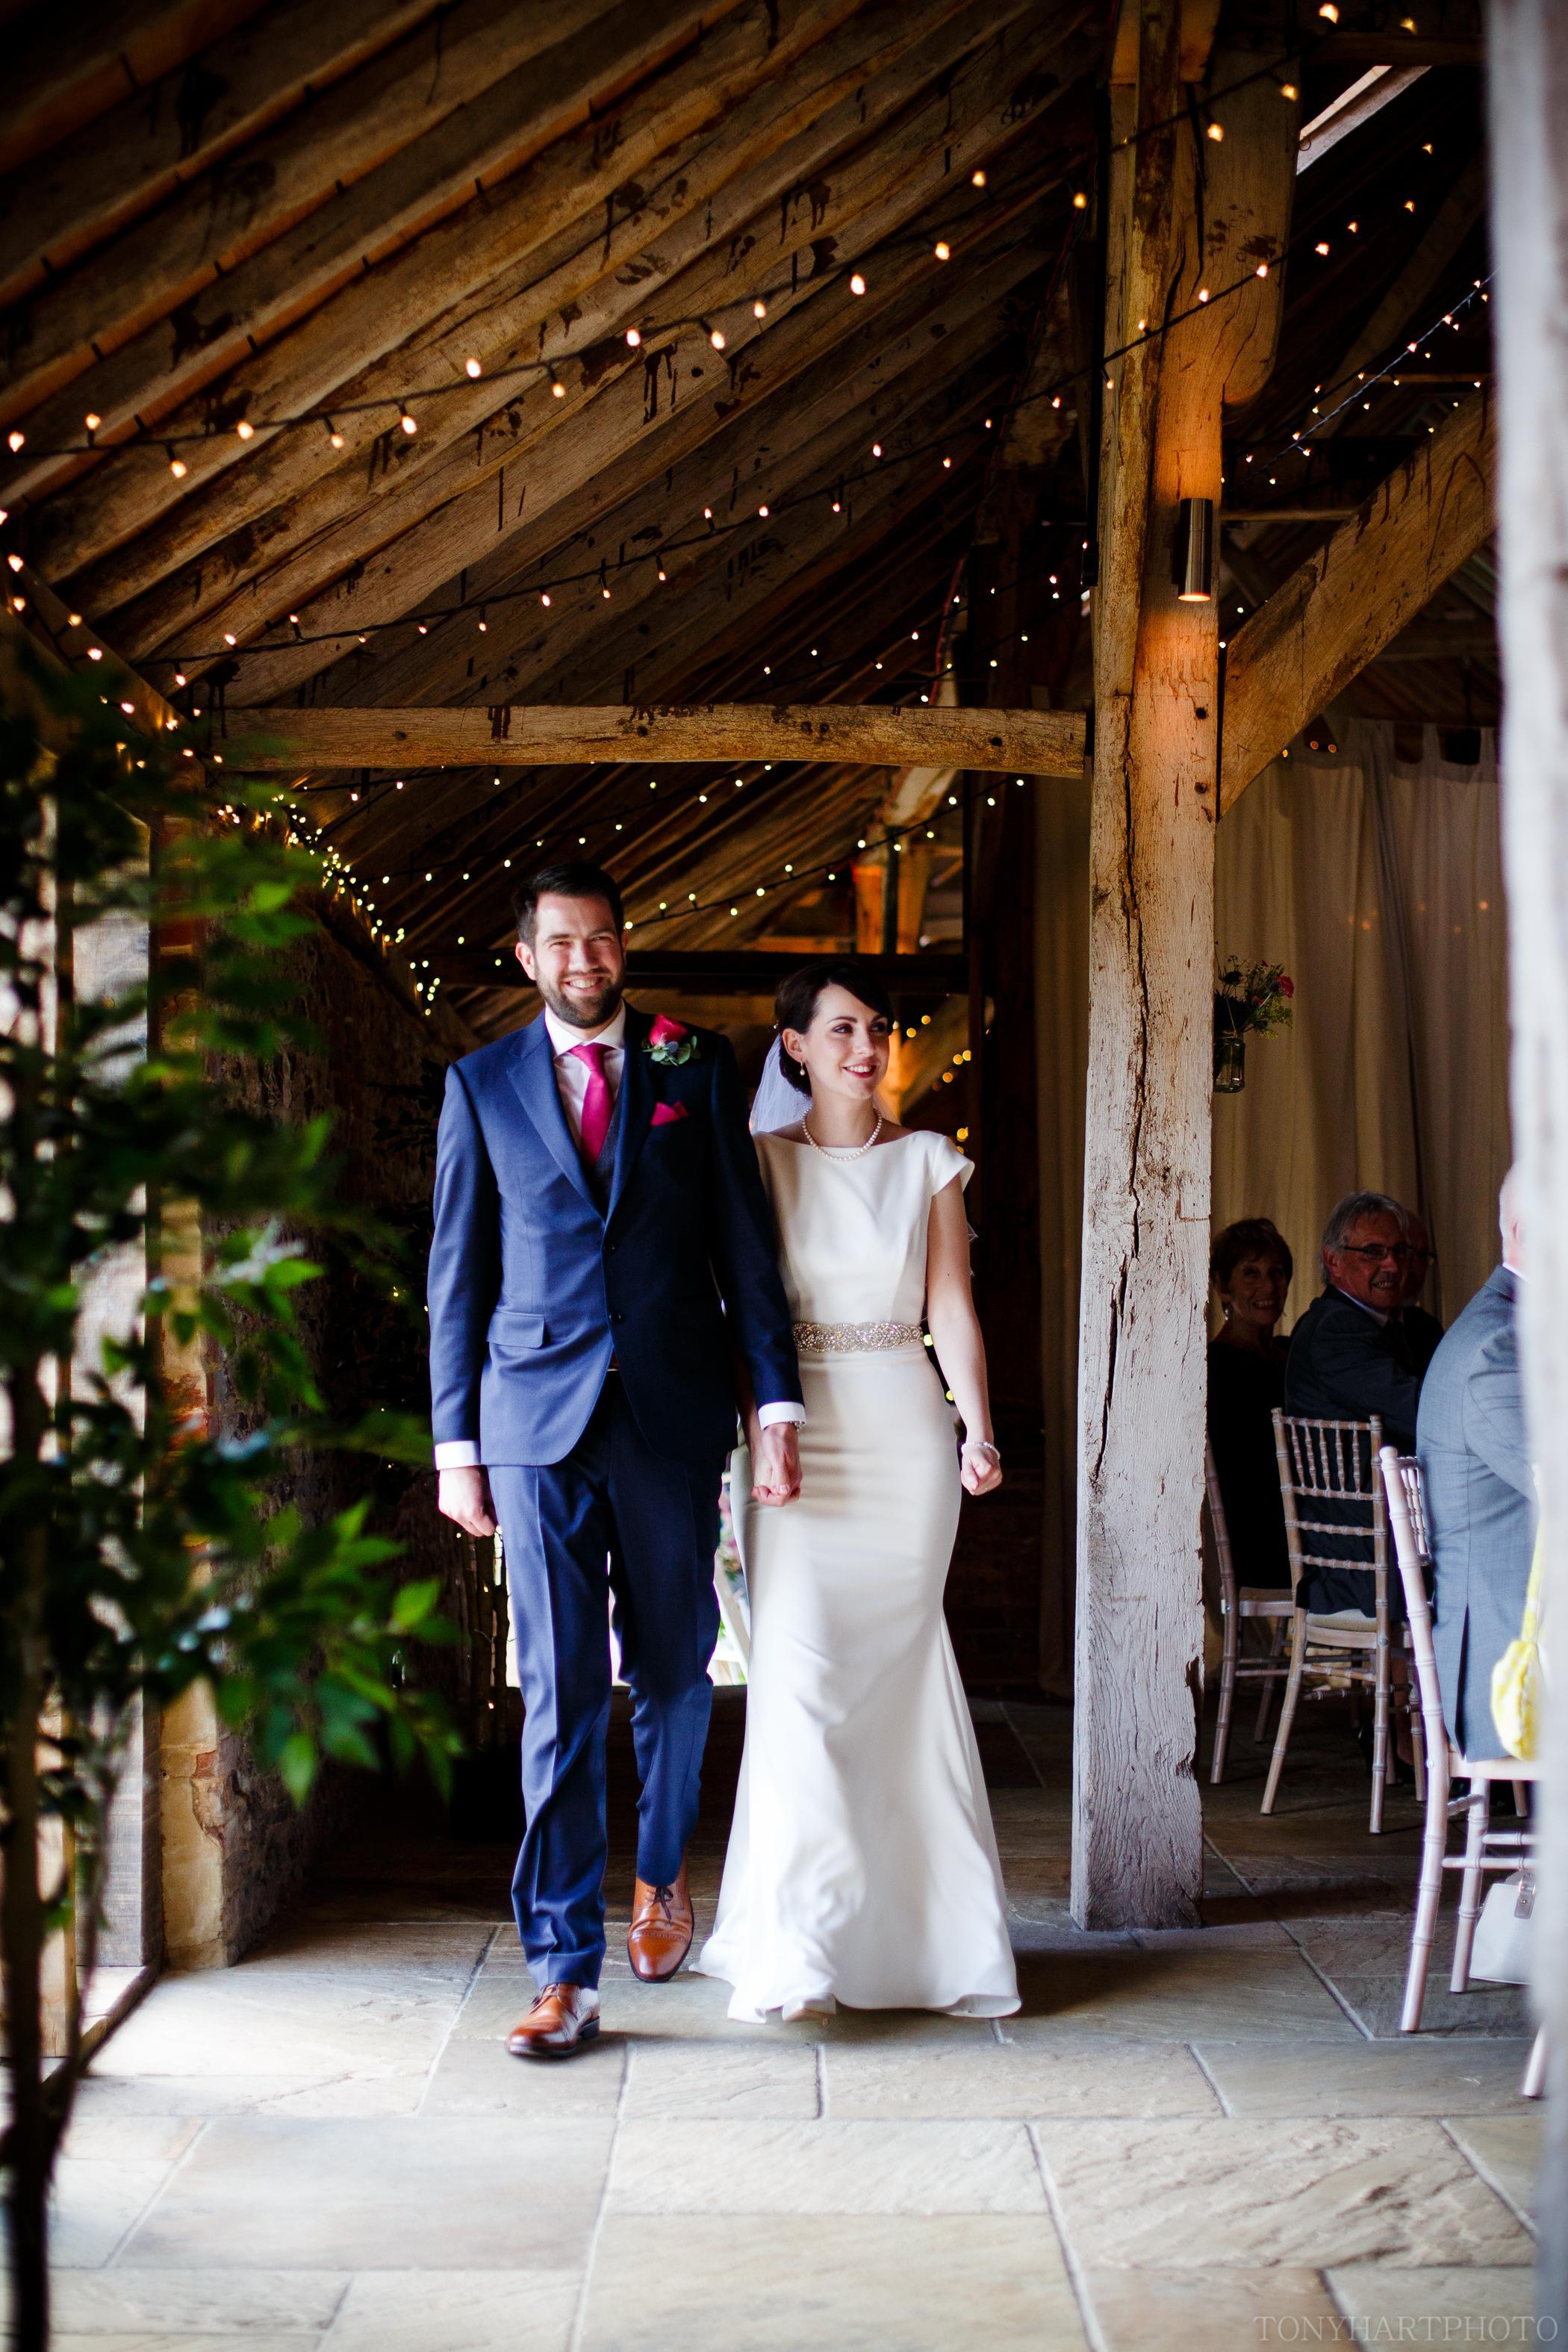 Phil and Emma enter their wedding breakfast